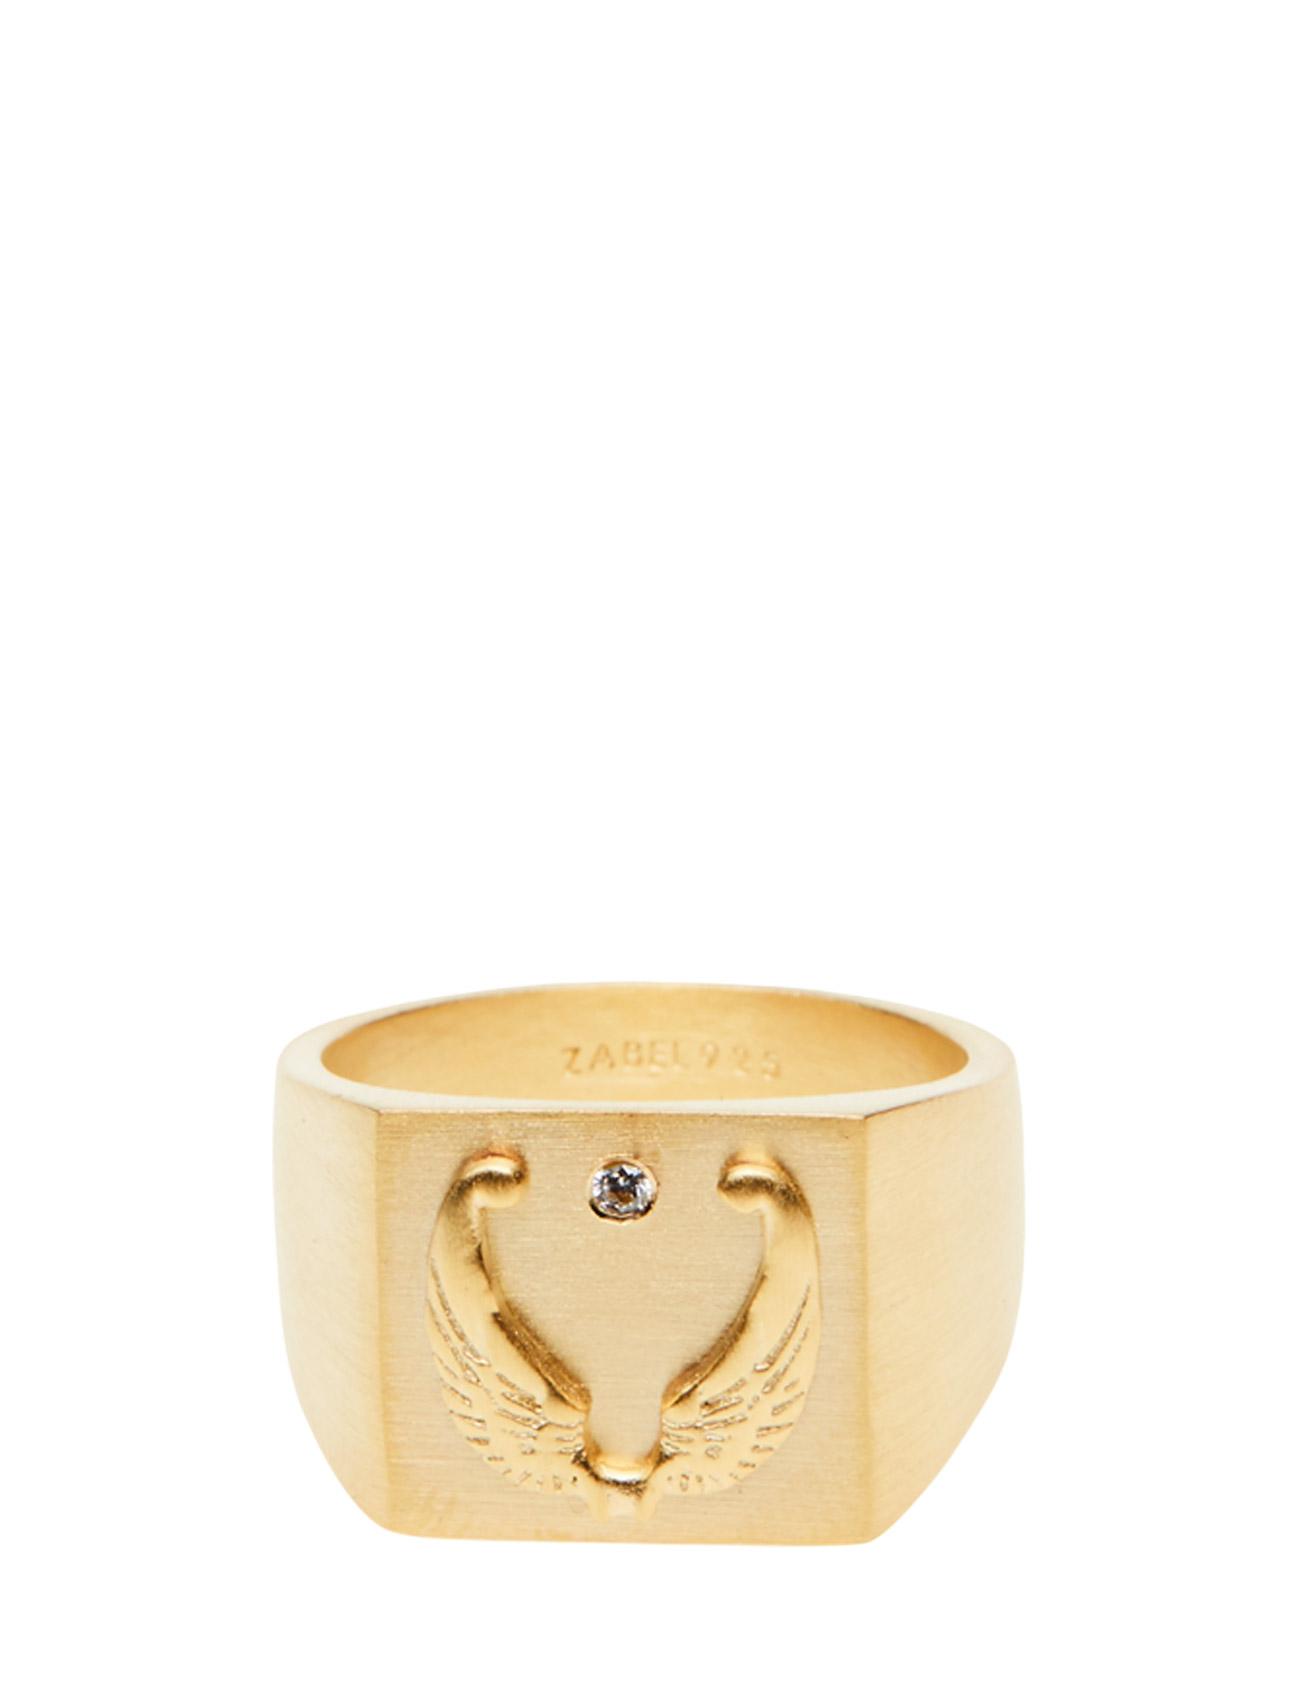 zabel jewellery – Signature fra boozt.com dk